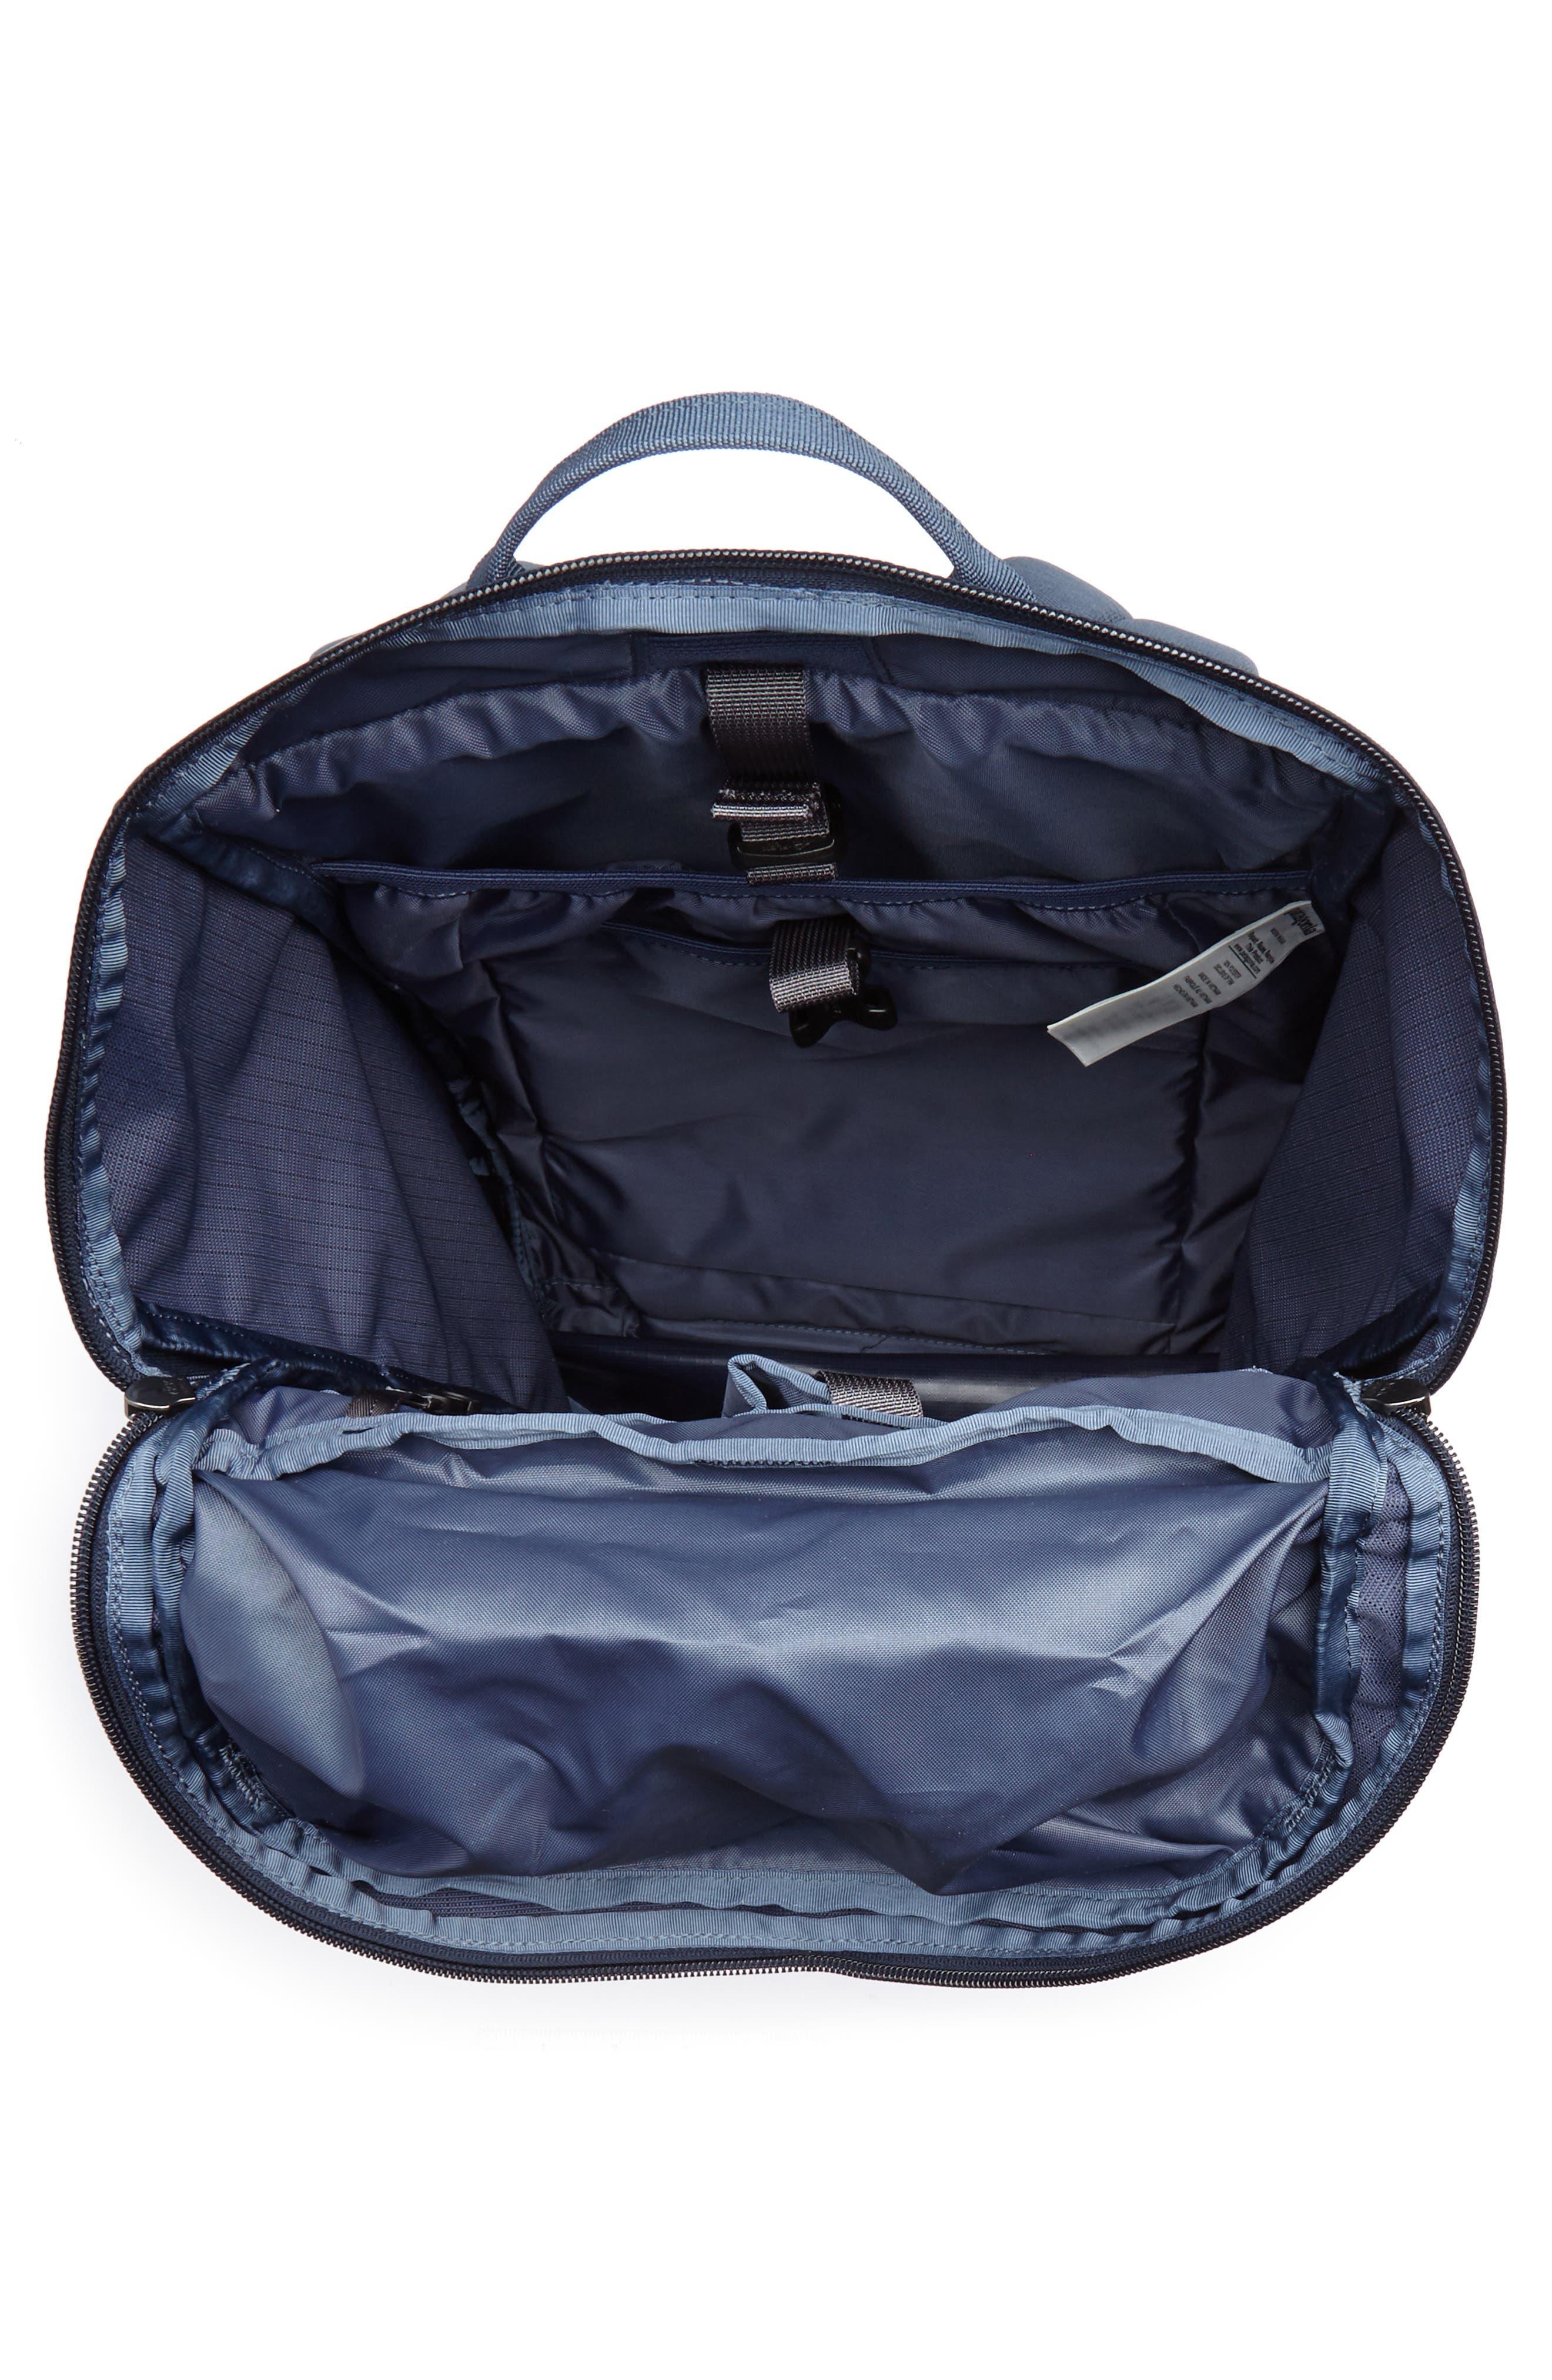 PATAGONIA, Black Hole 25 Liter Backpack, Alternate thumbnail 5, color, 404